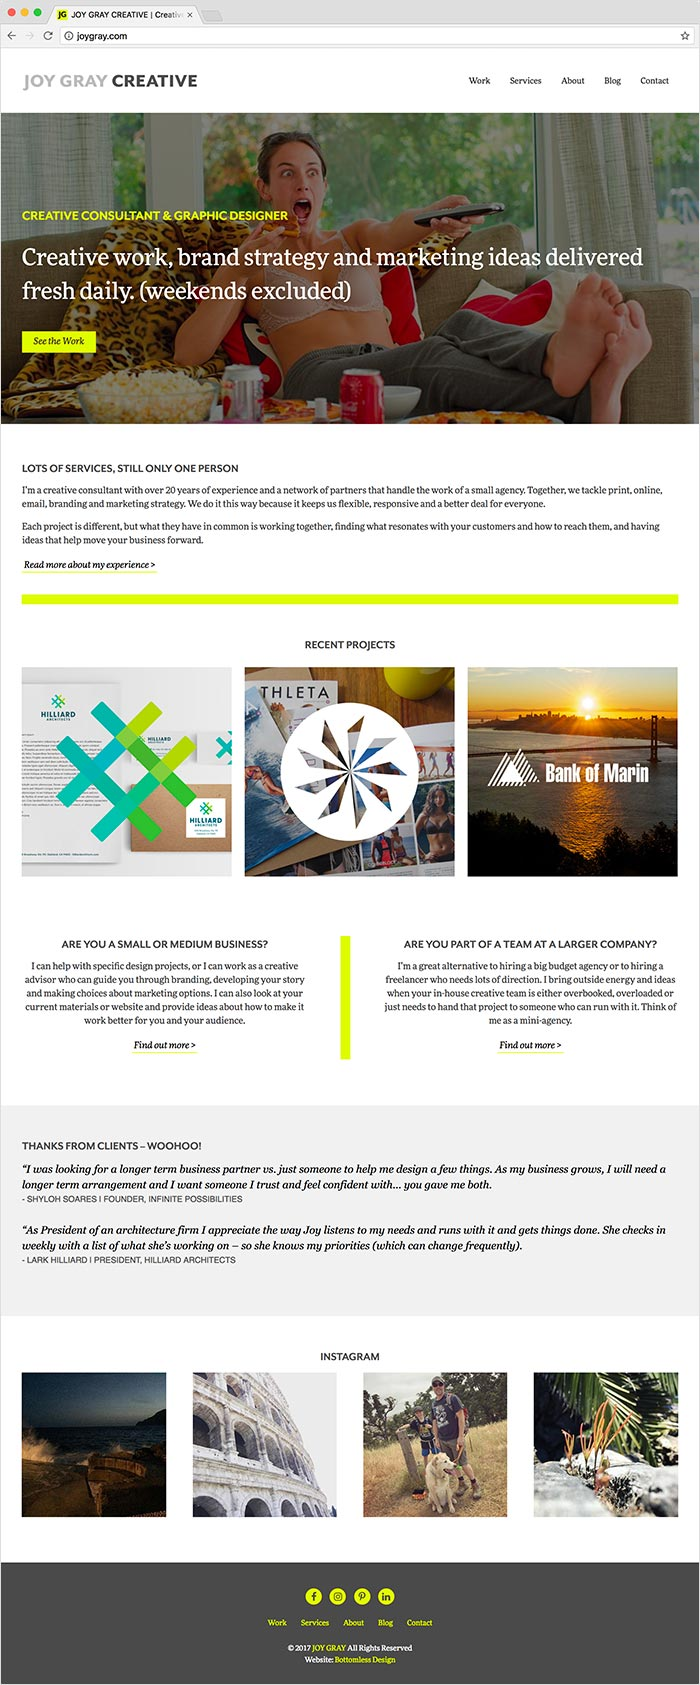 Joy Gray Creative website